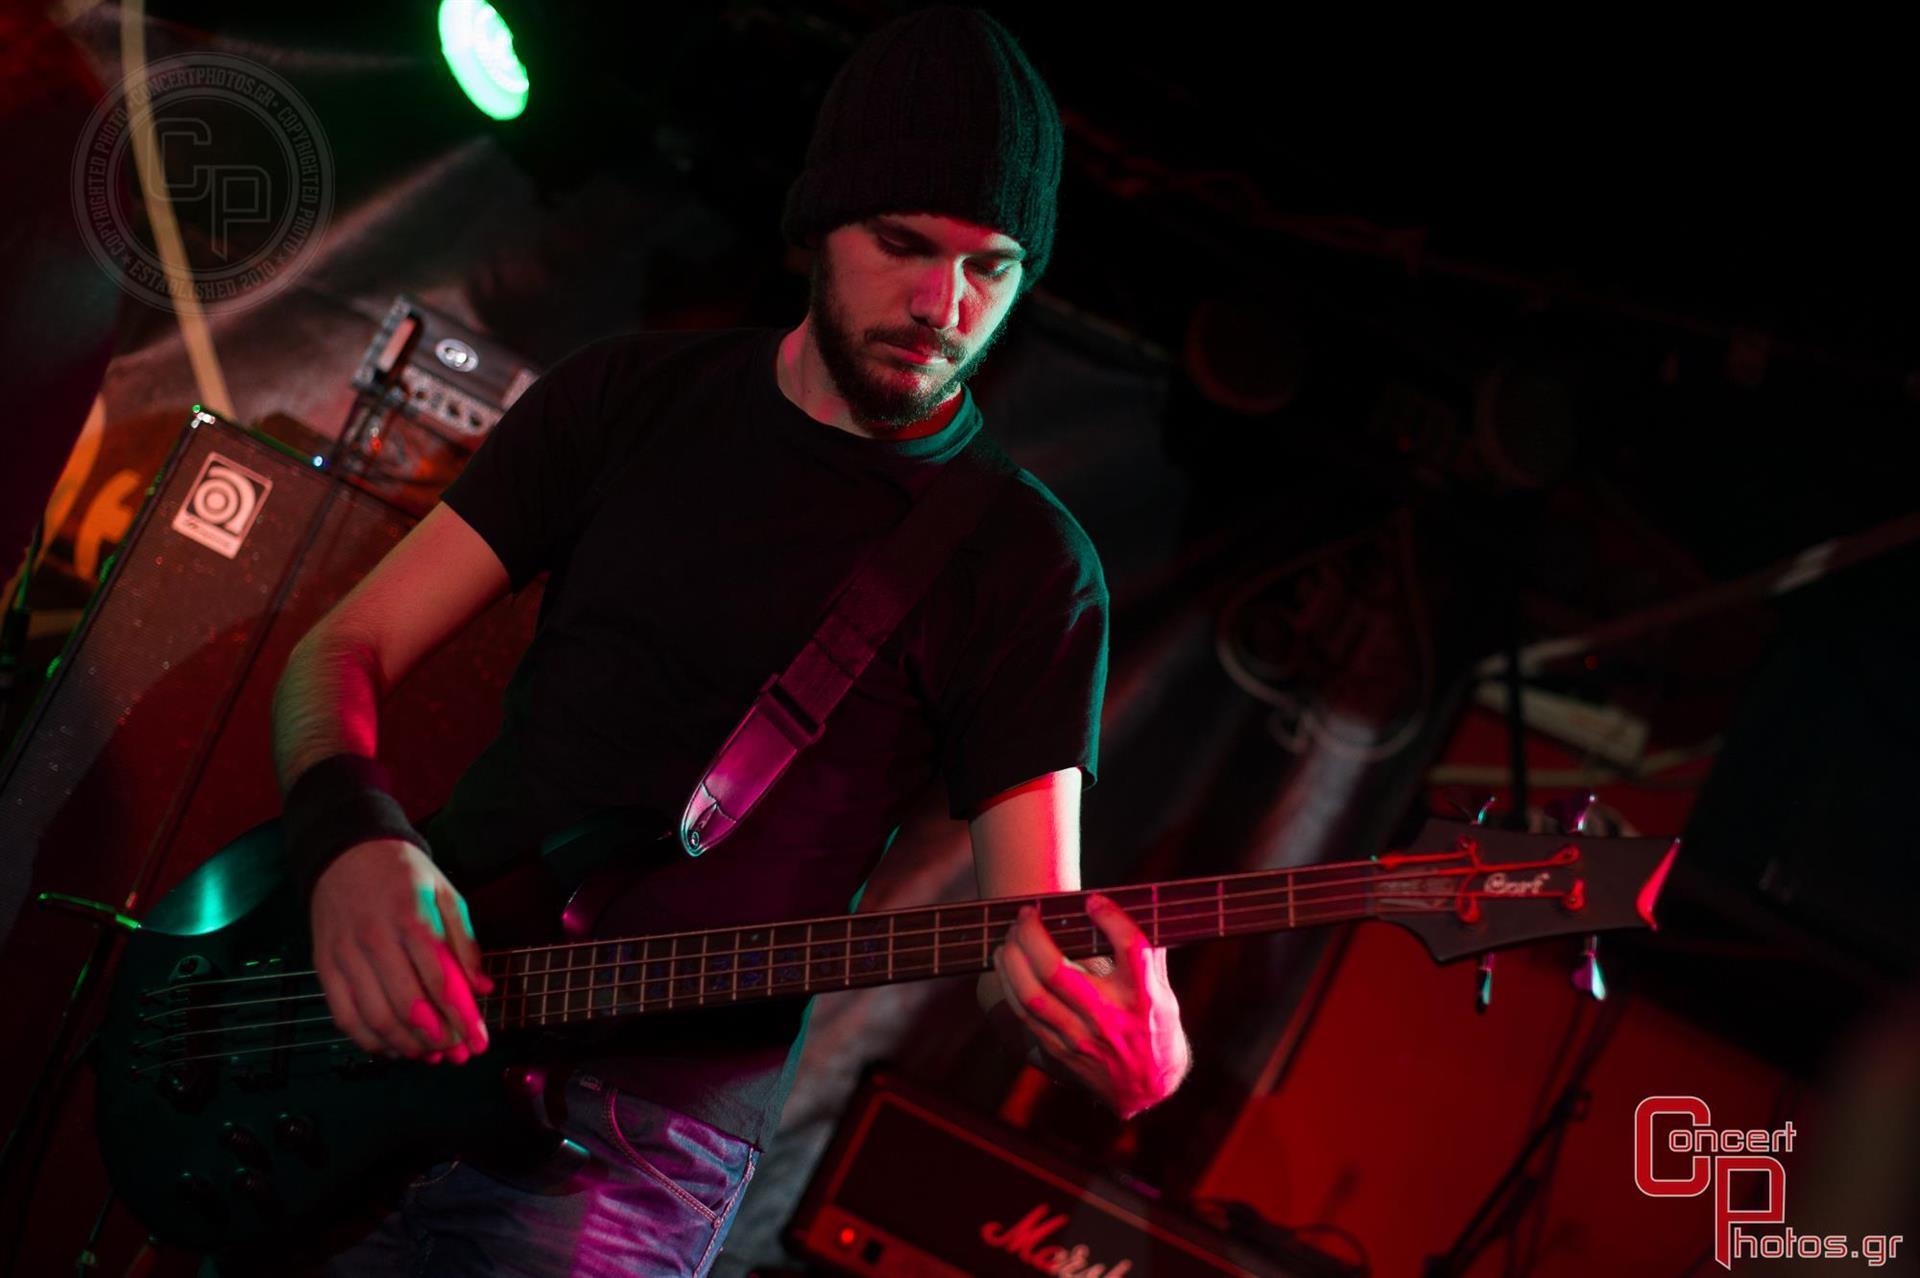 Battle Of The Bands Athens - Leg 3- photographer:  - ConcertPhotos - 20150104_2143_33